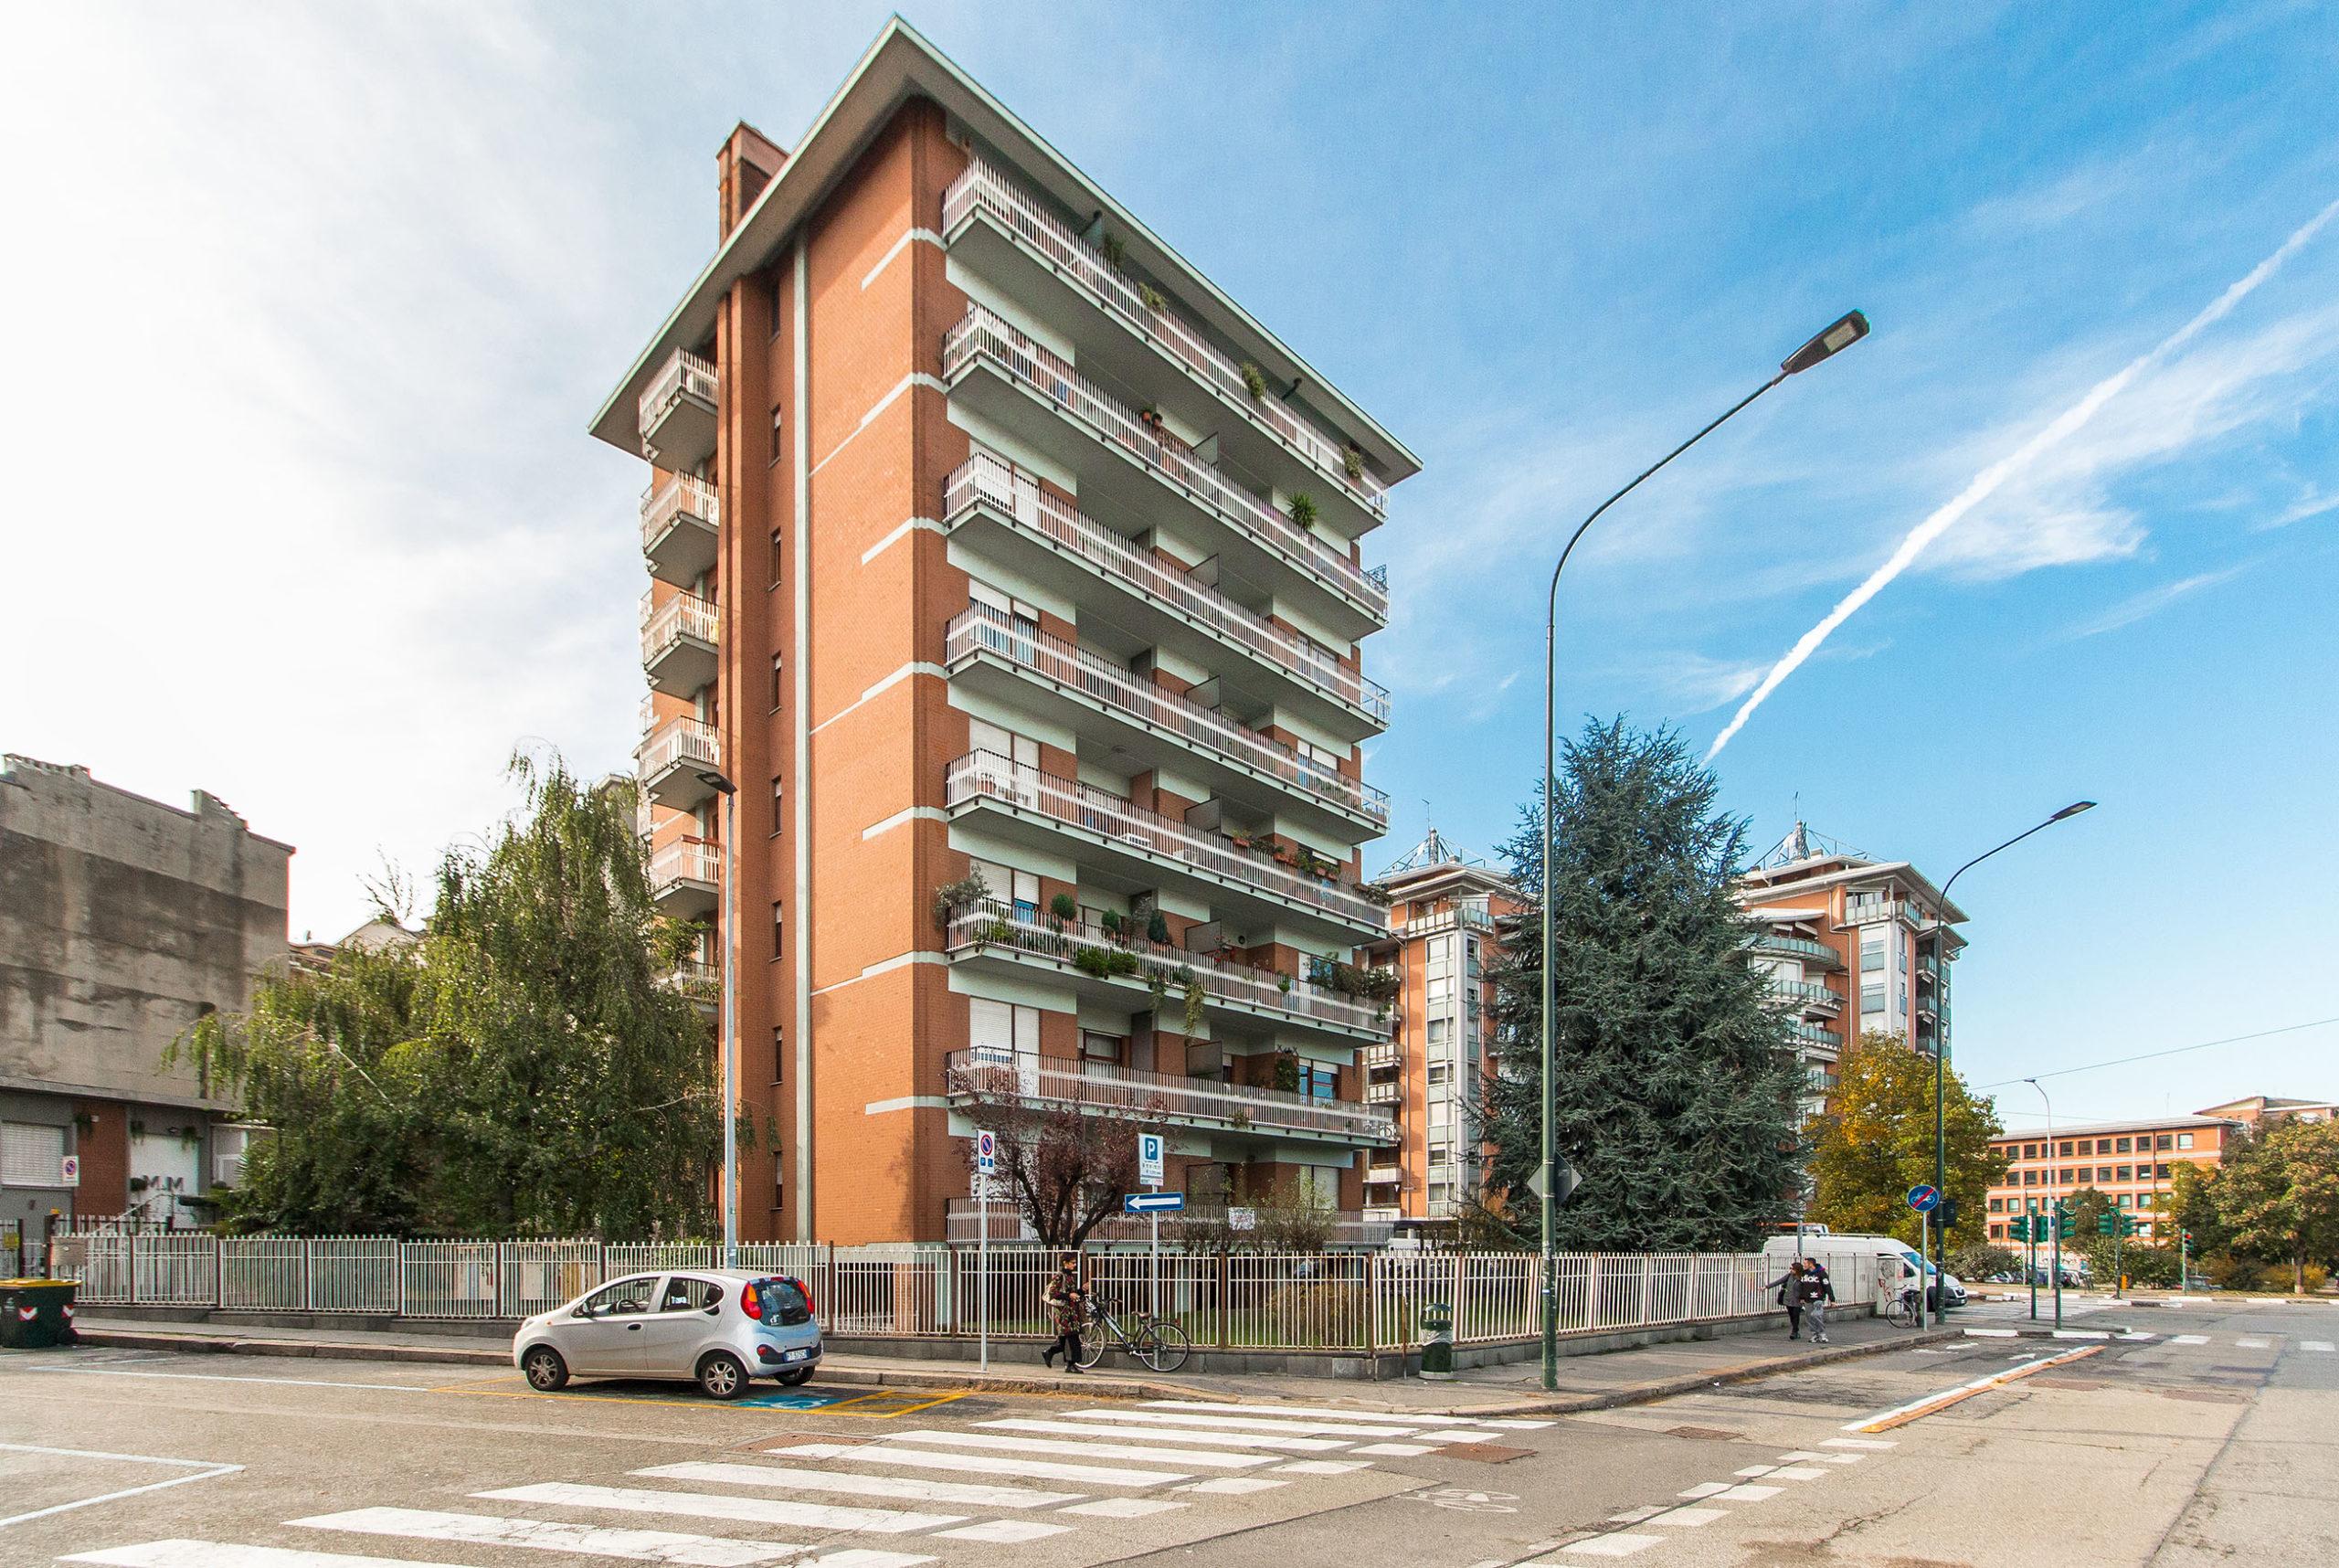 Quadrilocale: Corso Regio Parco, 12, Regio Parco, Torino